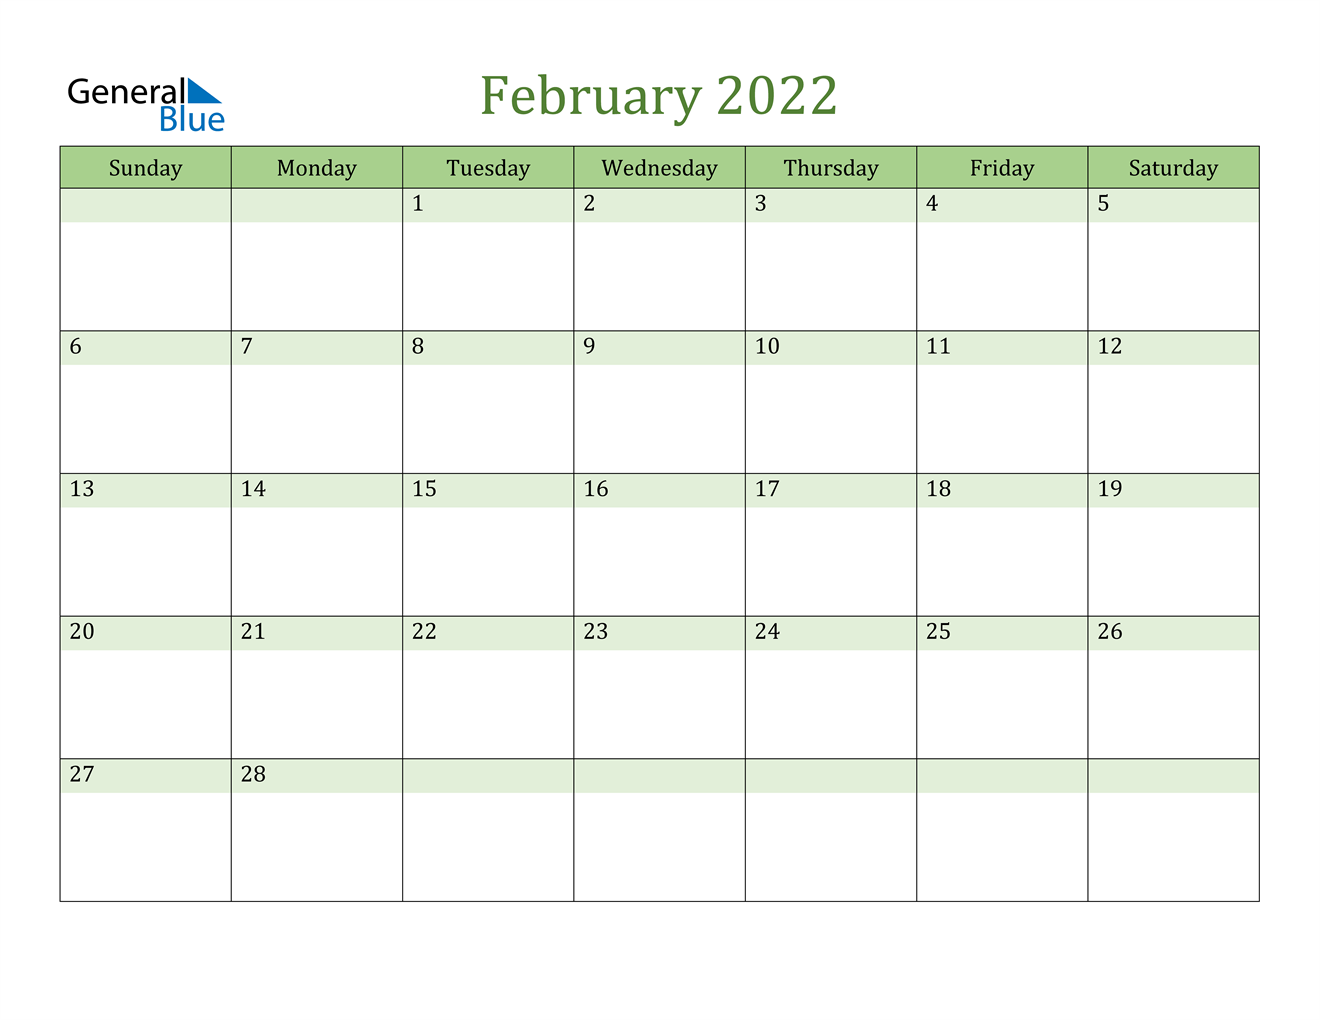 Image of February 2022 Cool and Relaxing Green Calendar Calendar